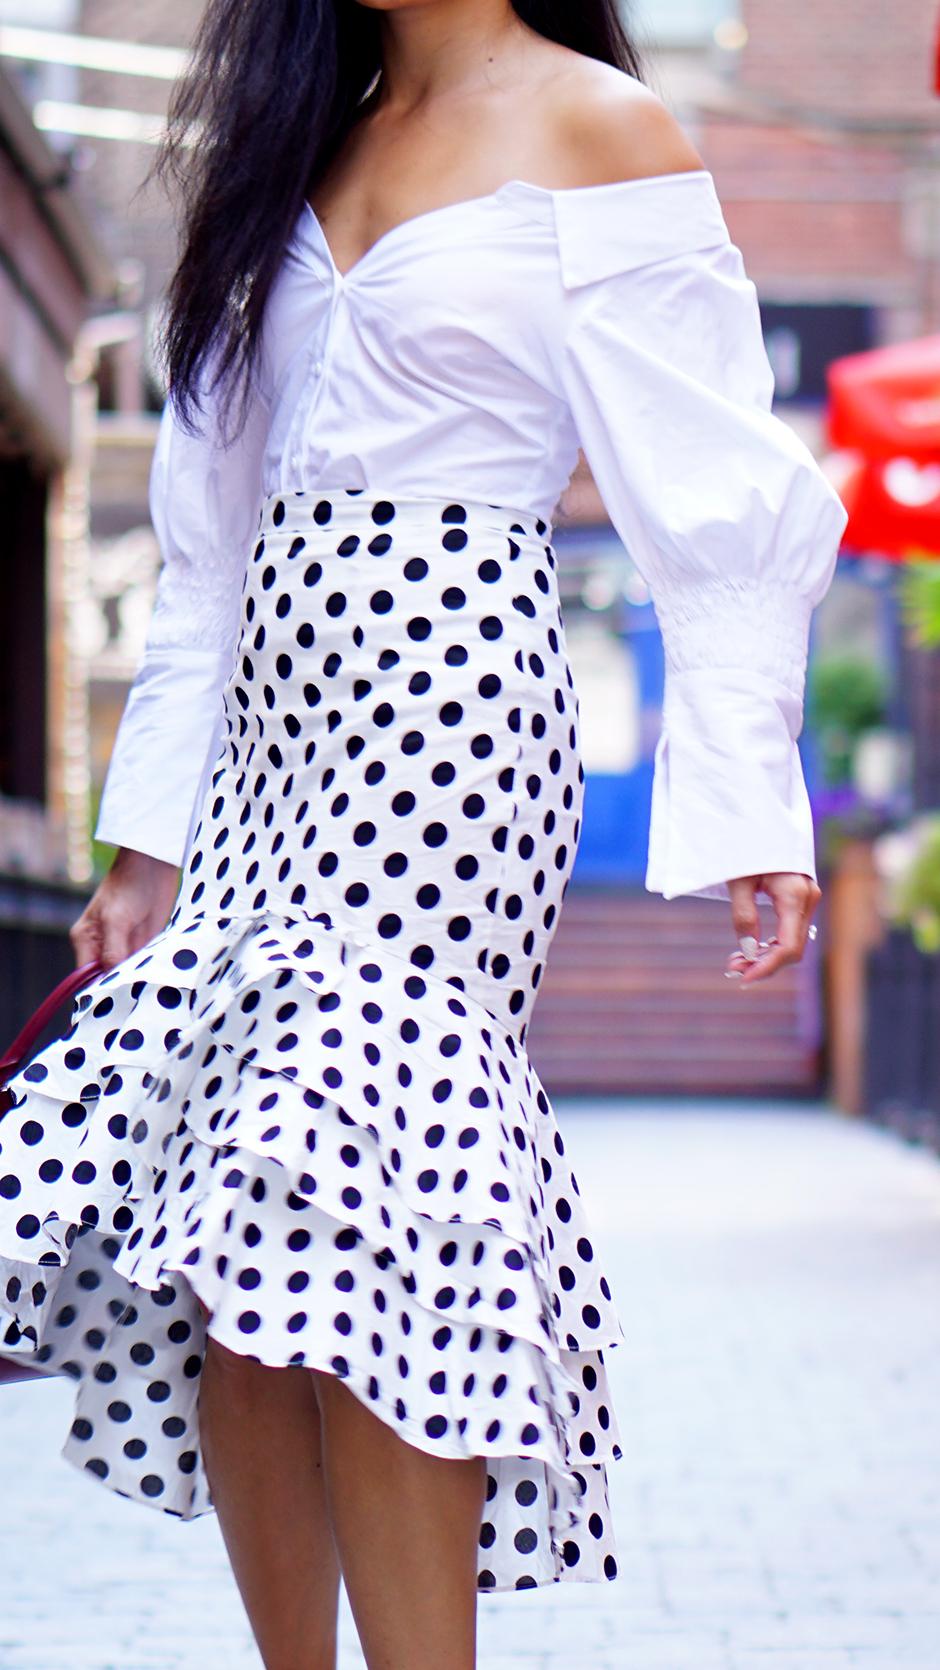 Polka Dot Ruffle Skirt & Statement Sleeve - Street Style Outfit Ideas #streetstyle #outfitinspo #outfitideas #frenchdesigner #frenchstyle #paris #pfw #ruffleskirt #highlowskirt #outfitinspiration #fashionblogger #fashionblog #streetfashion #citystyle #summerstyle #fallstyle #fallwinter #miumiu #prada #jacquemus #asianblogger #canadianblogger #usblogger #topbloggers #topfashionbloggers #polkadotskirt #redbag #offtheshoulder #whiteshirt